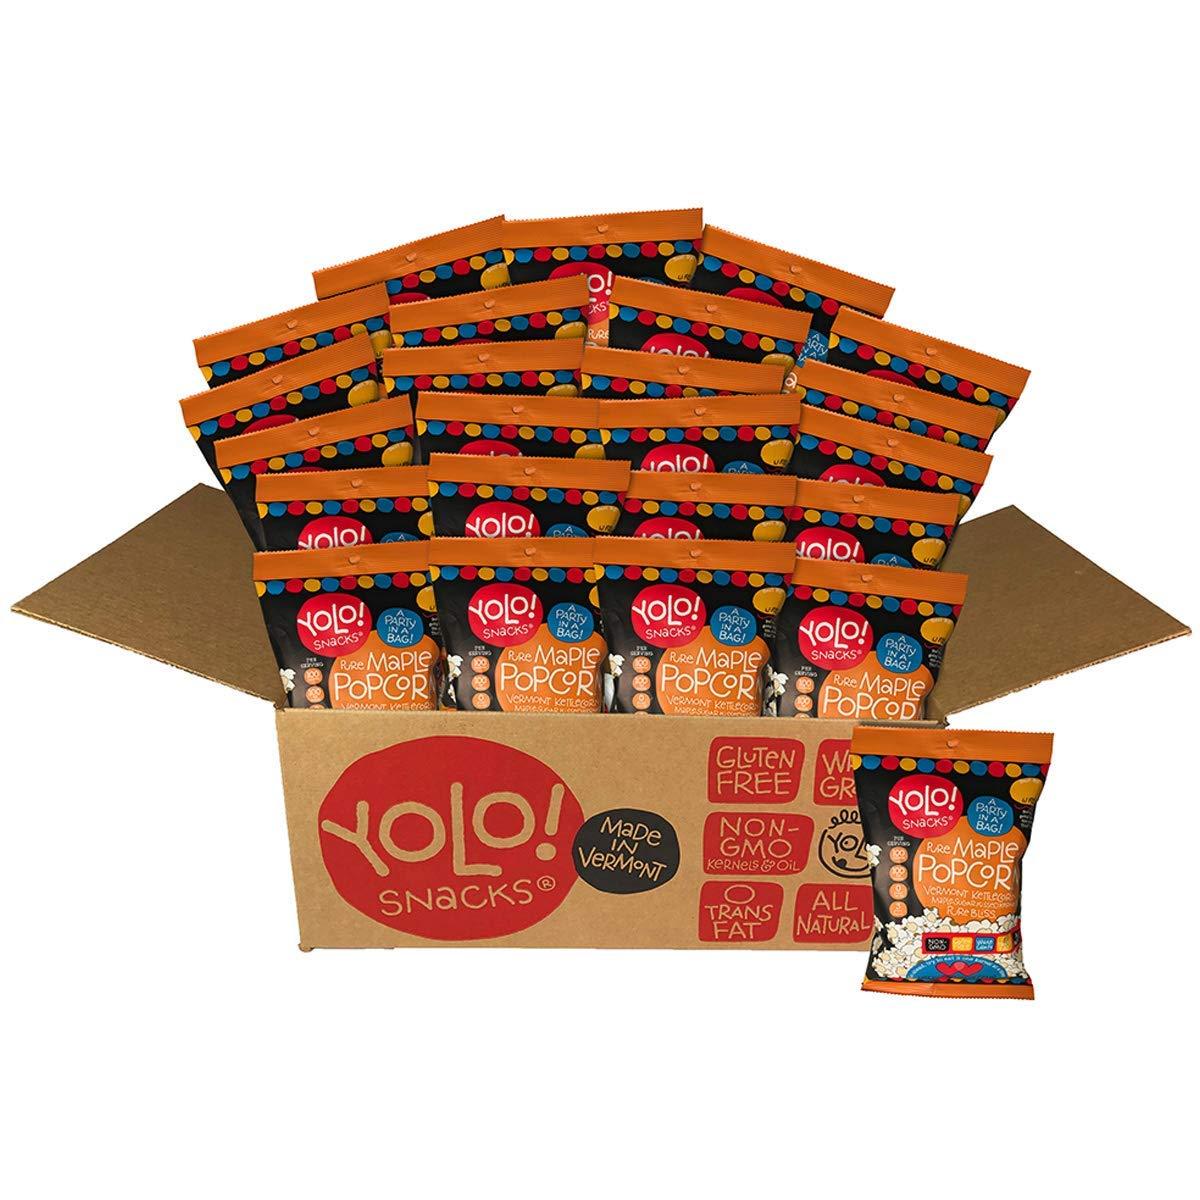 YOLO! Snacks – Gourmet Maple Flavor Individual Bag Popped Popcorn - 21 Grams - 24 Count Case